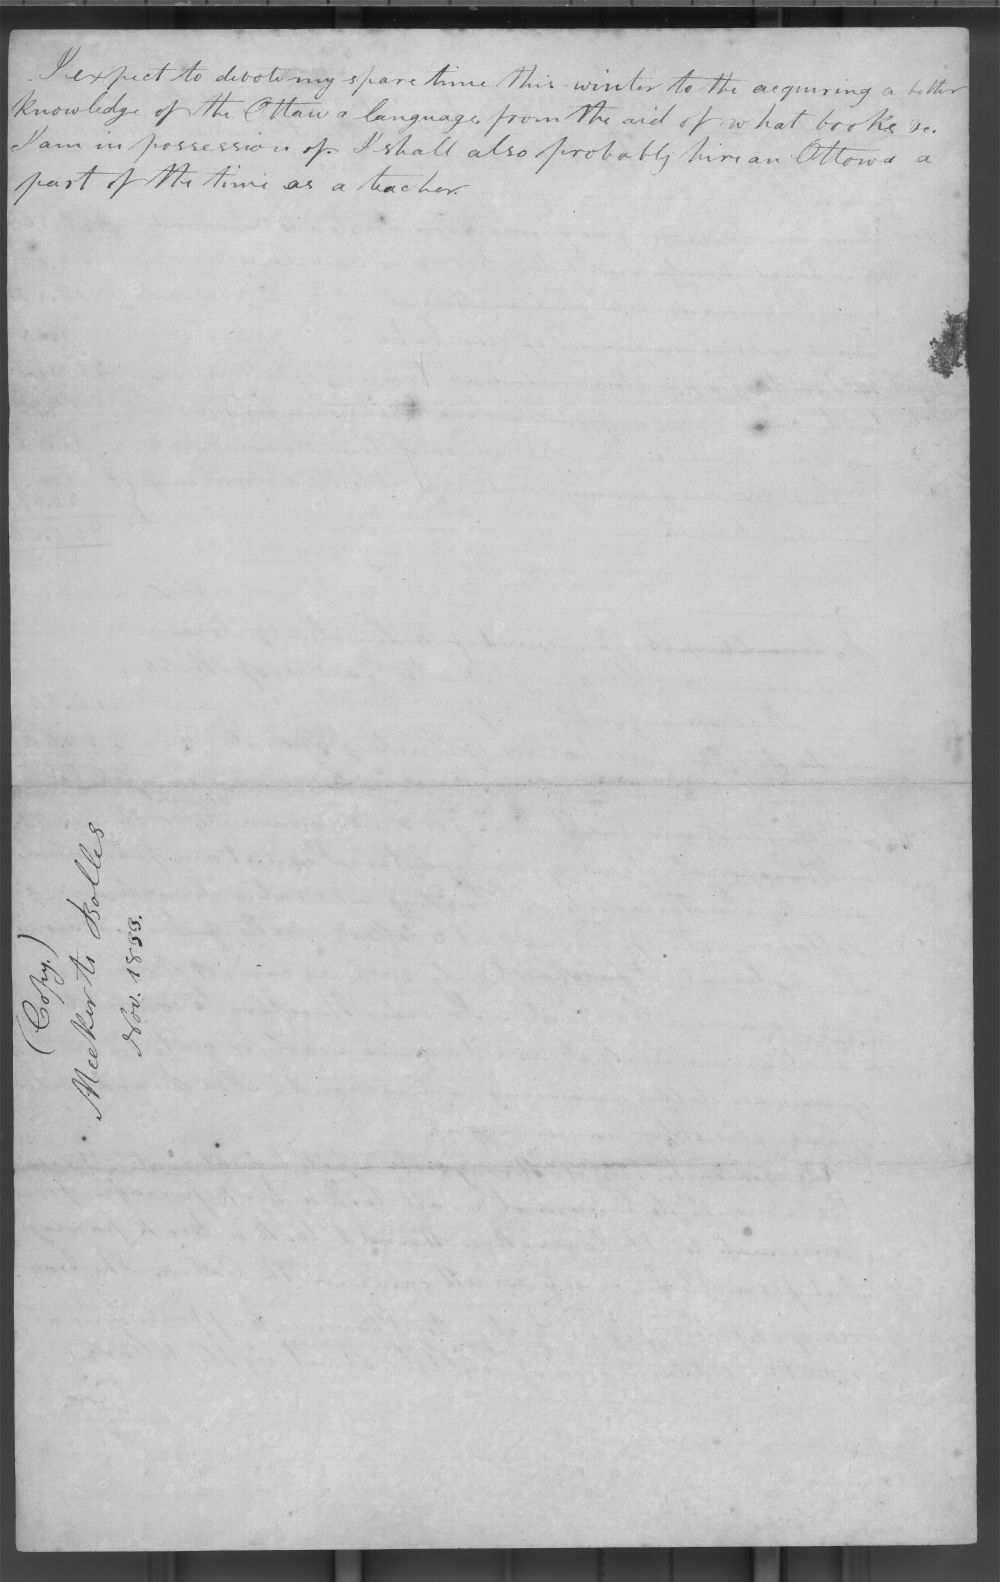 Jotham Meeker to Rev. Lucius Bolles - 4